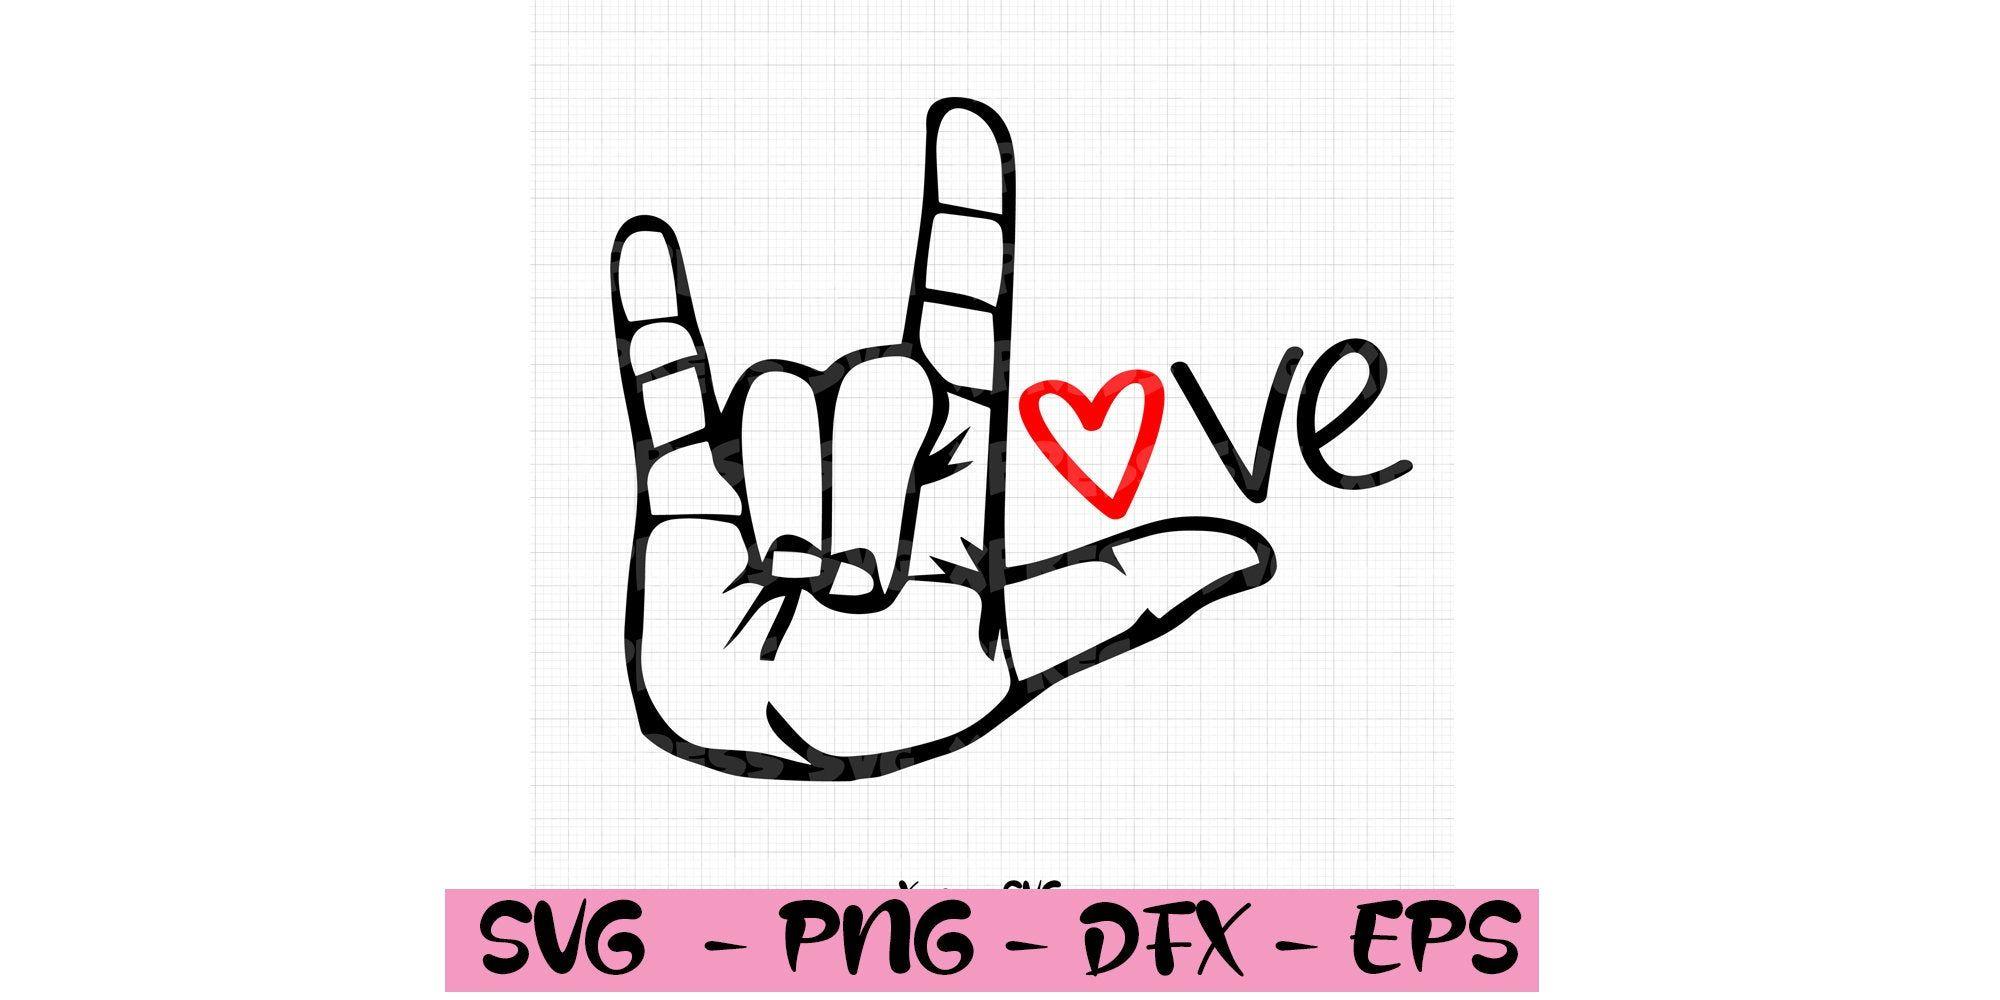 I Love You Hand Sign Language Asl Love Valentine S Day Etsy In 2020 Hand Sign Language Love Valentines My Love